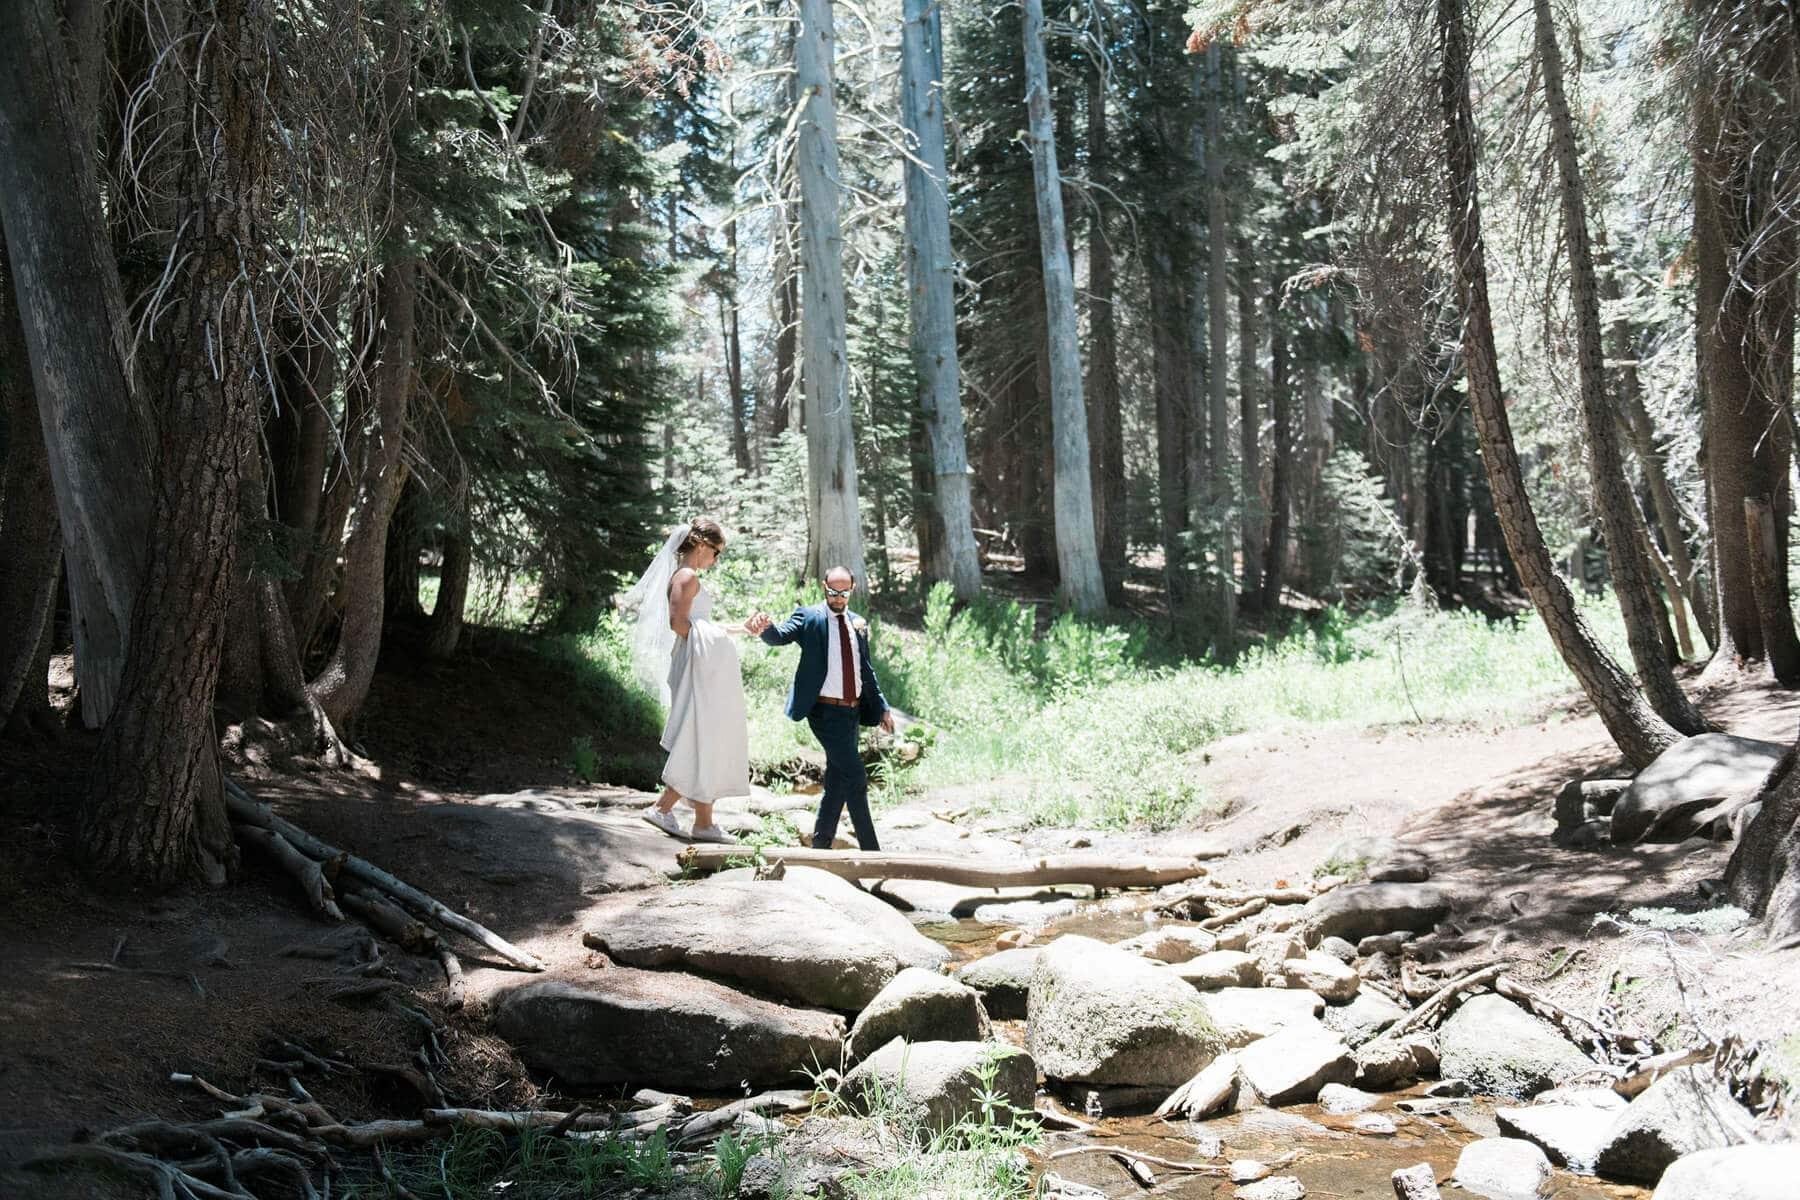 groom holding bride's hand as she walks over creek during yosemite adventure elopement